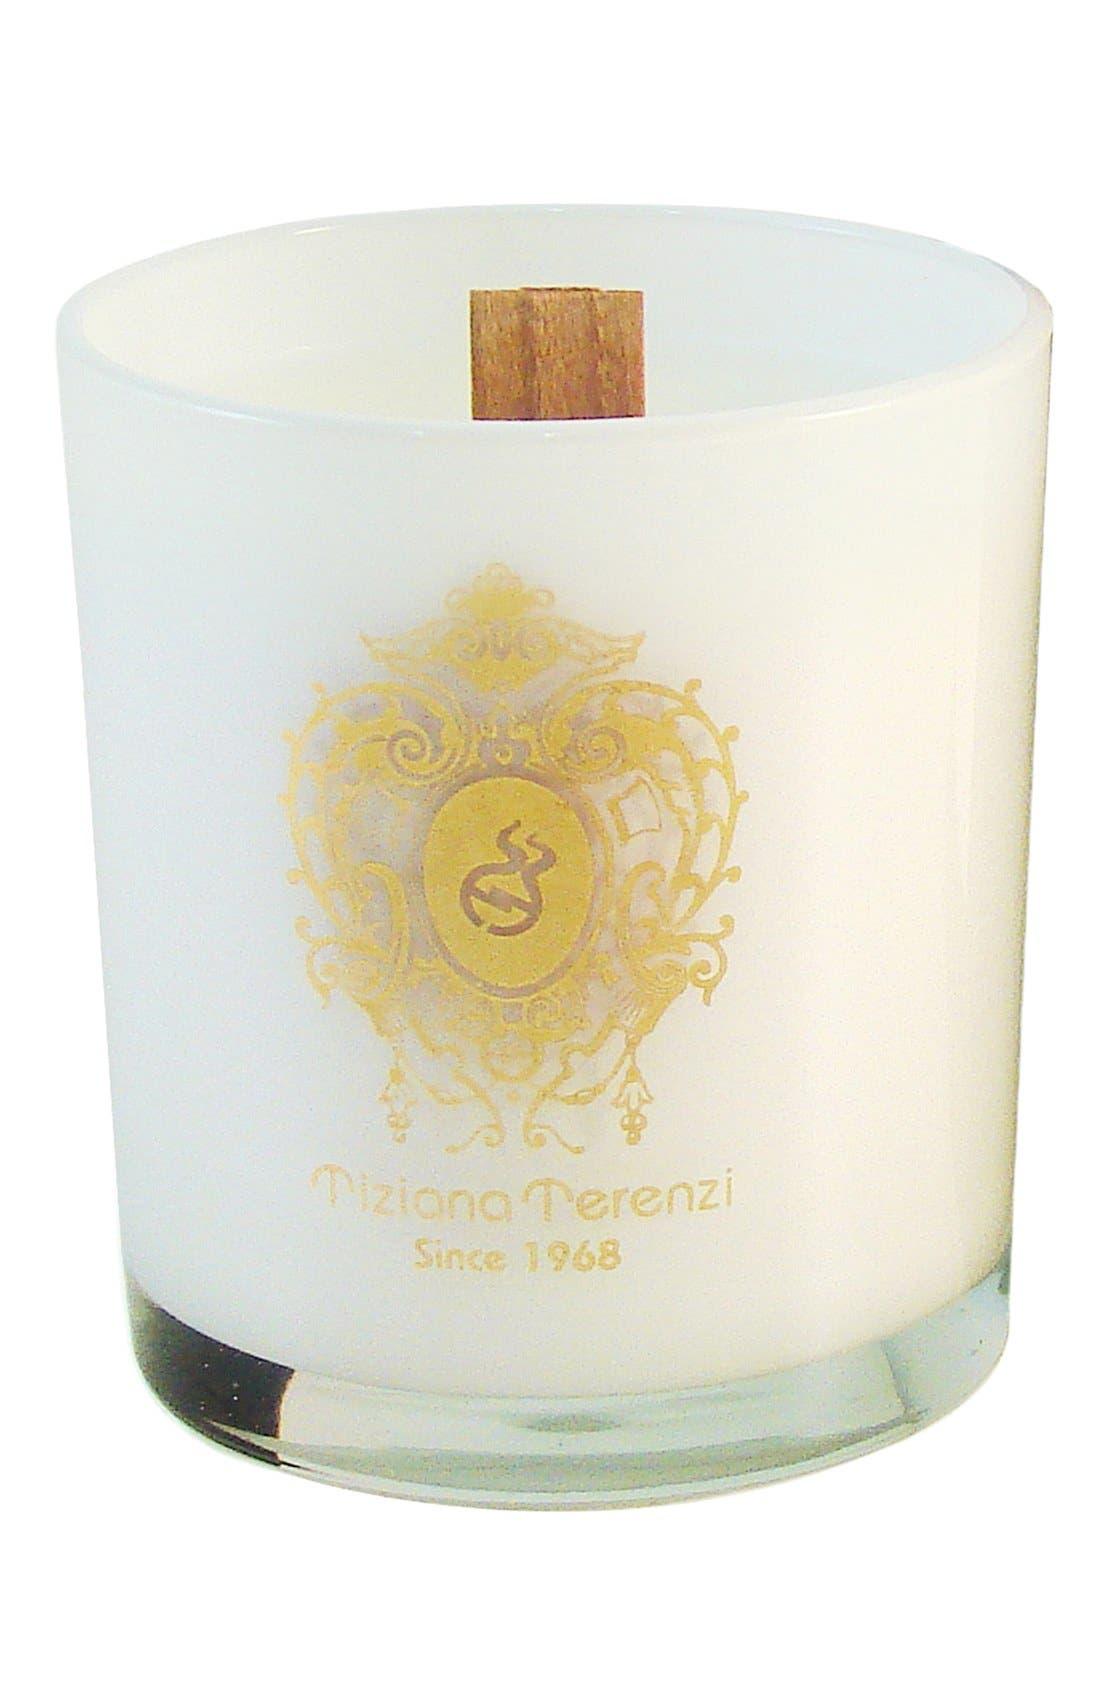 Main Image - Tiziana Terenzi 'Ischia Orchid' Single Wick Gioconda Candle